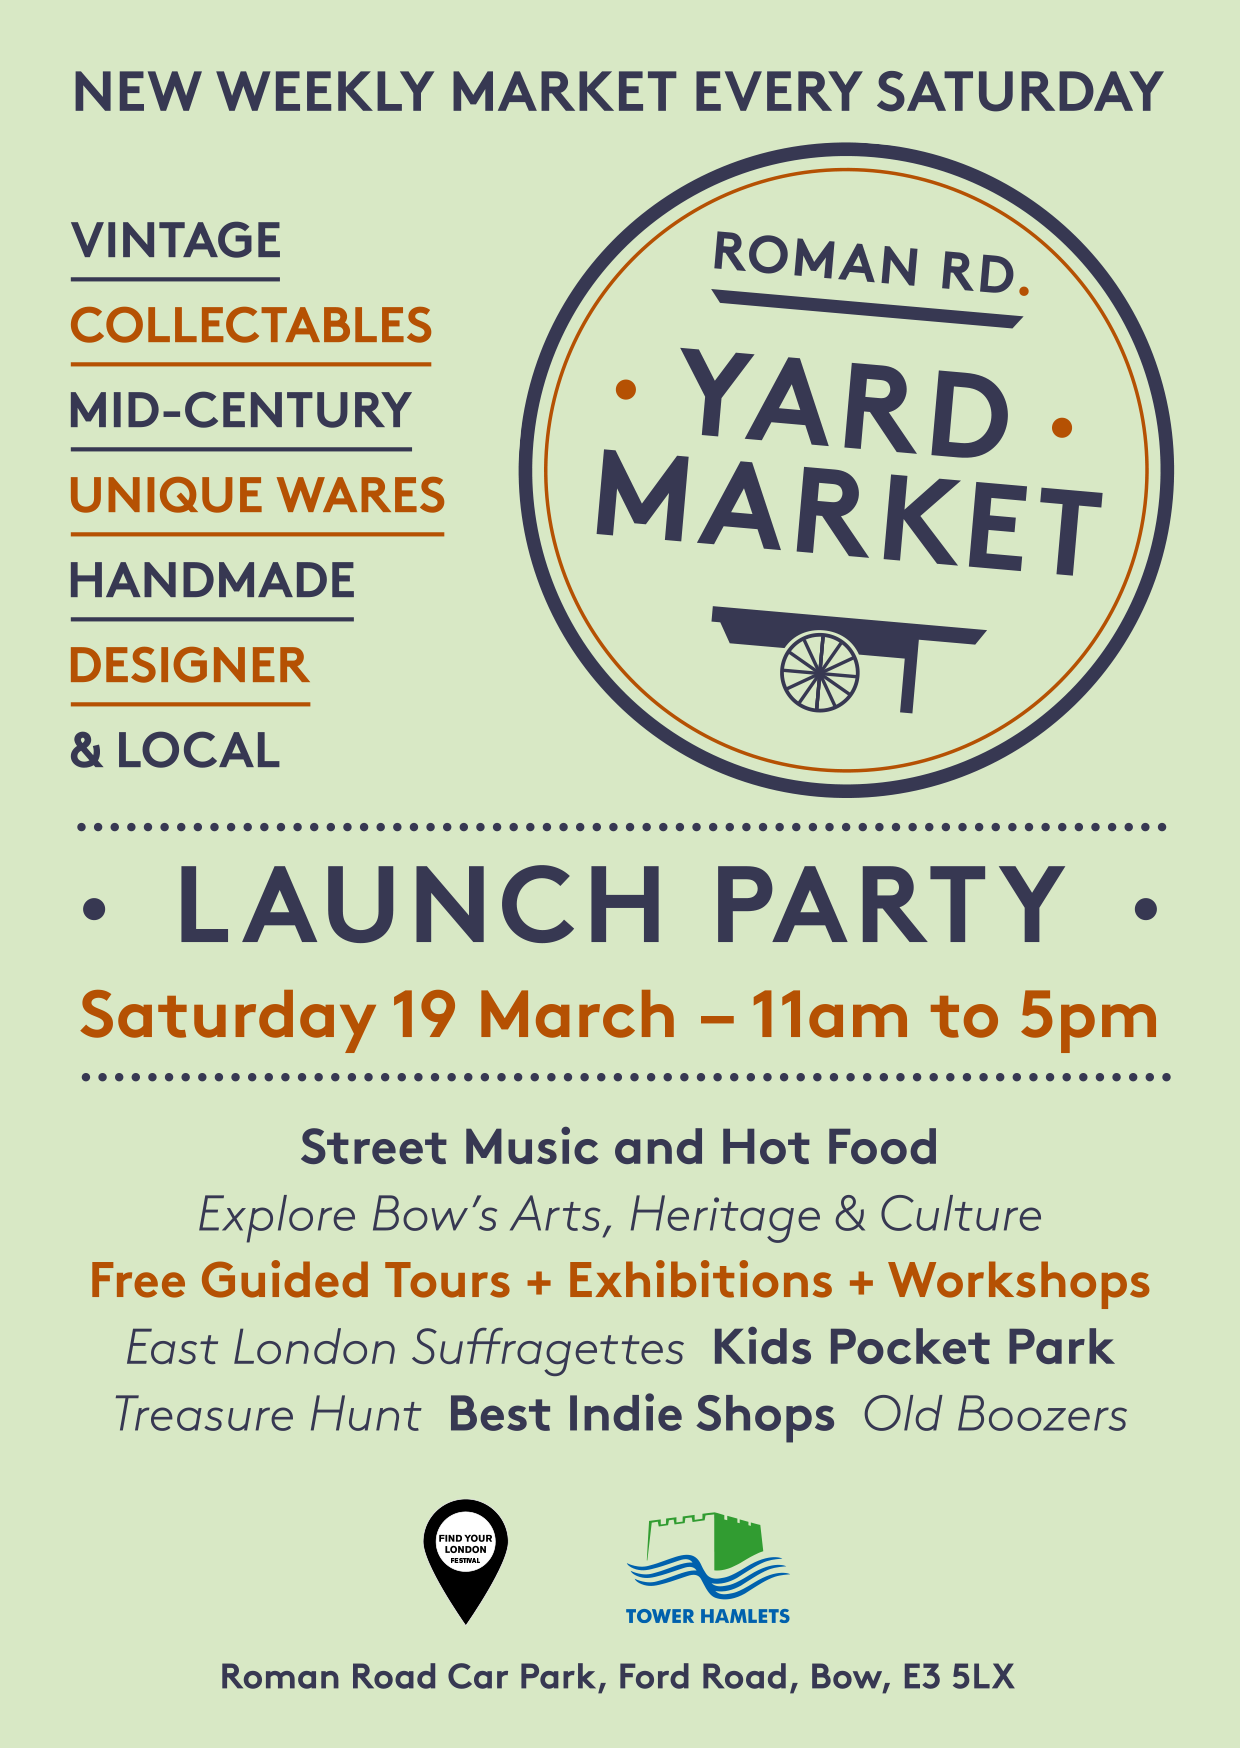 Roman Road Yard Market flyer